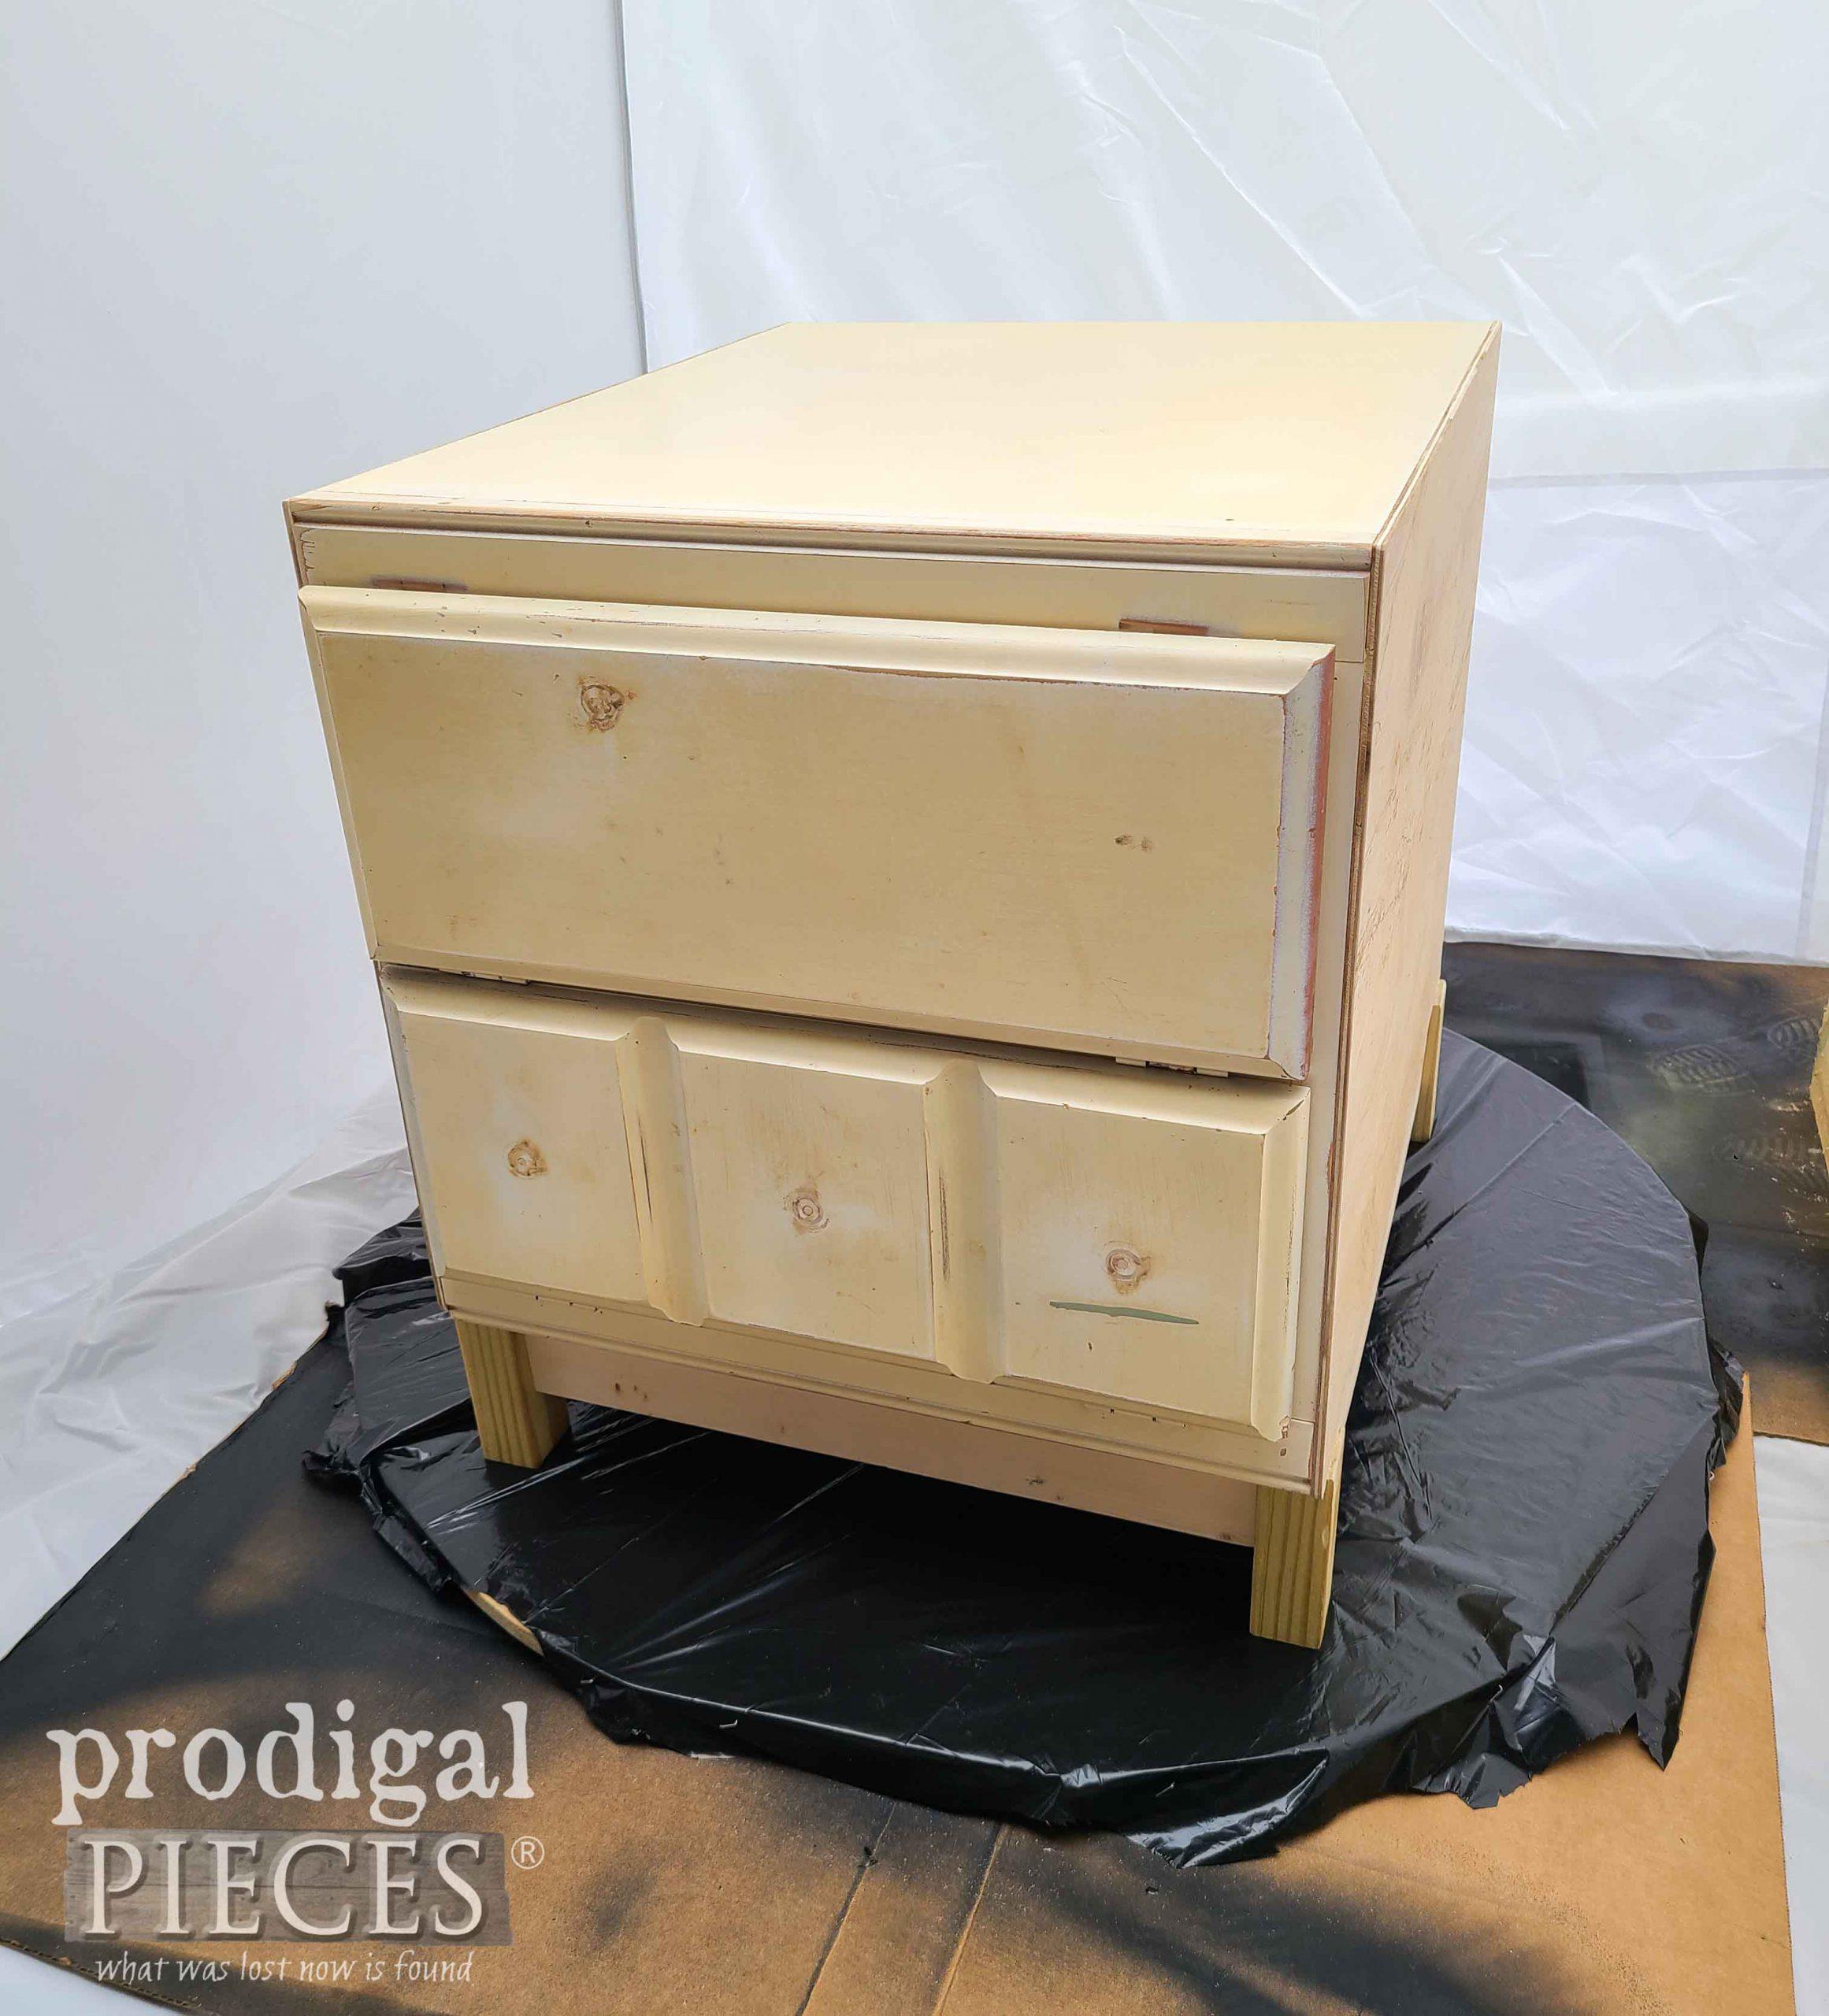 Rebuilt Vintage Cabinet Side Table Before   prodigalpieces.com